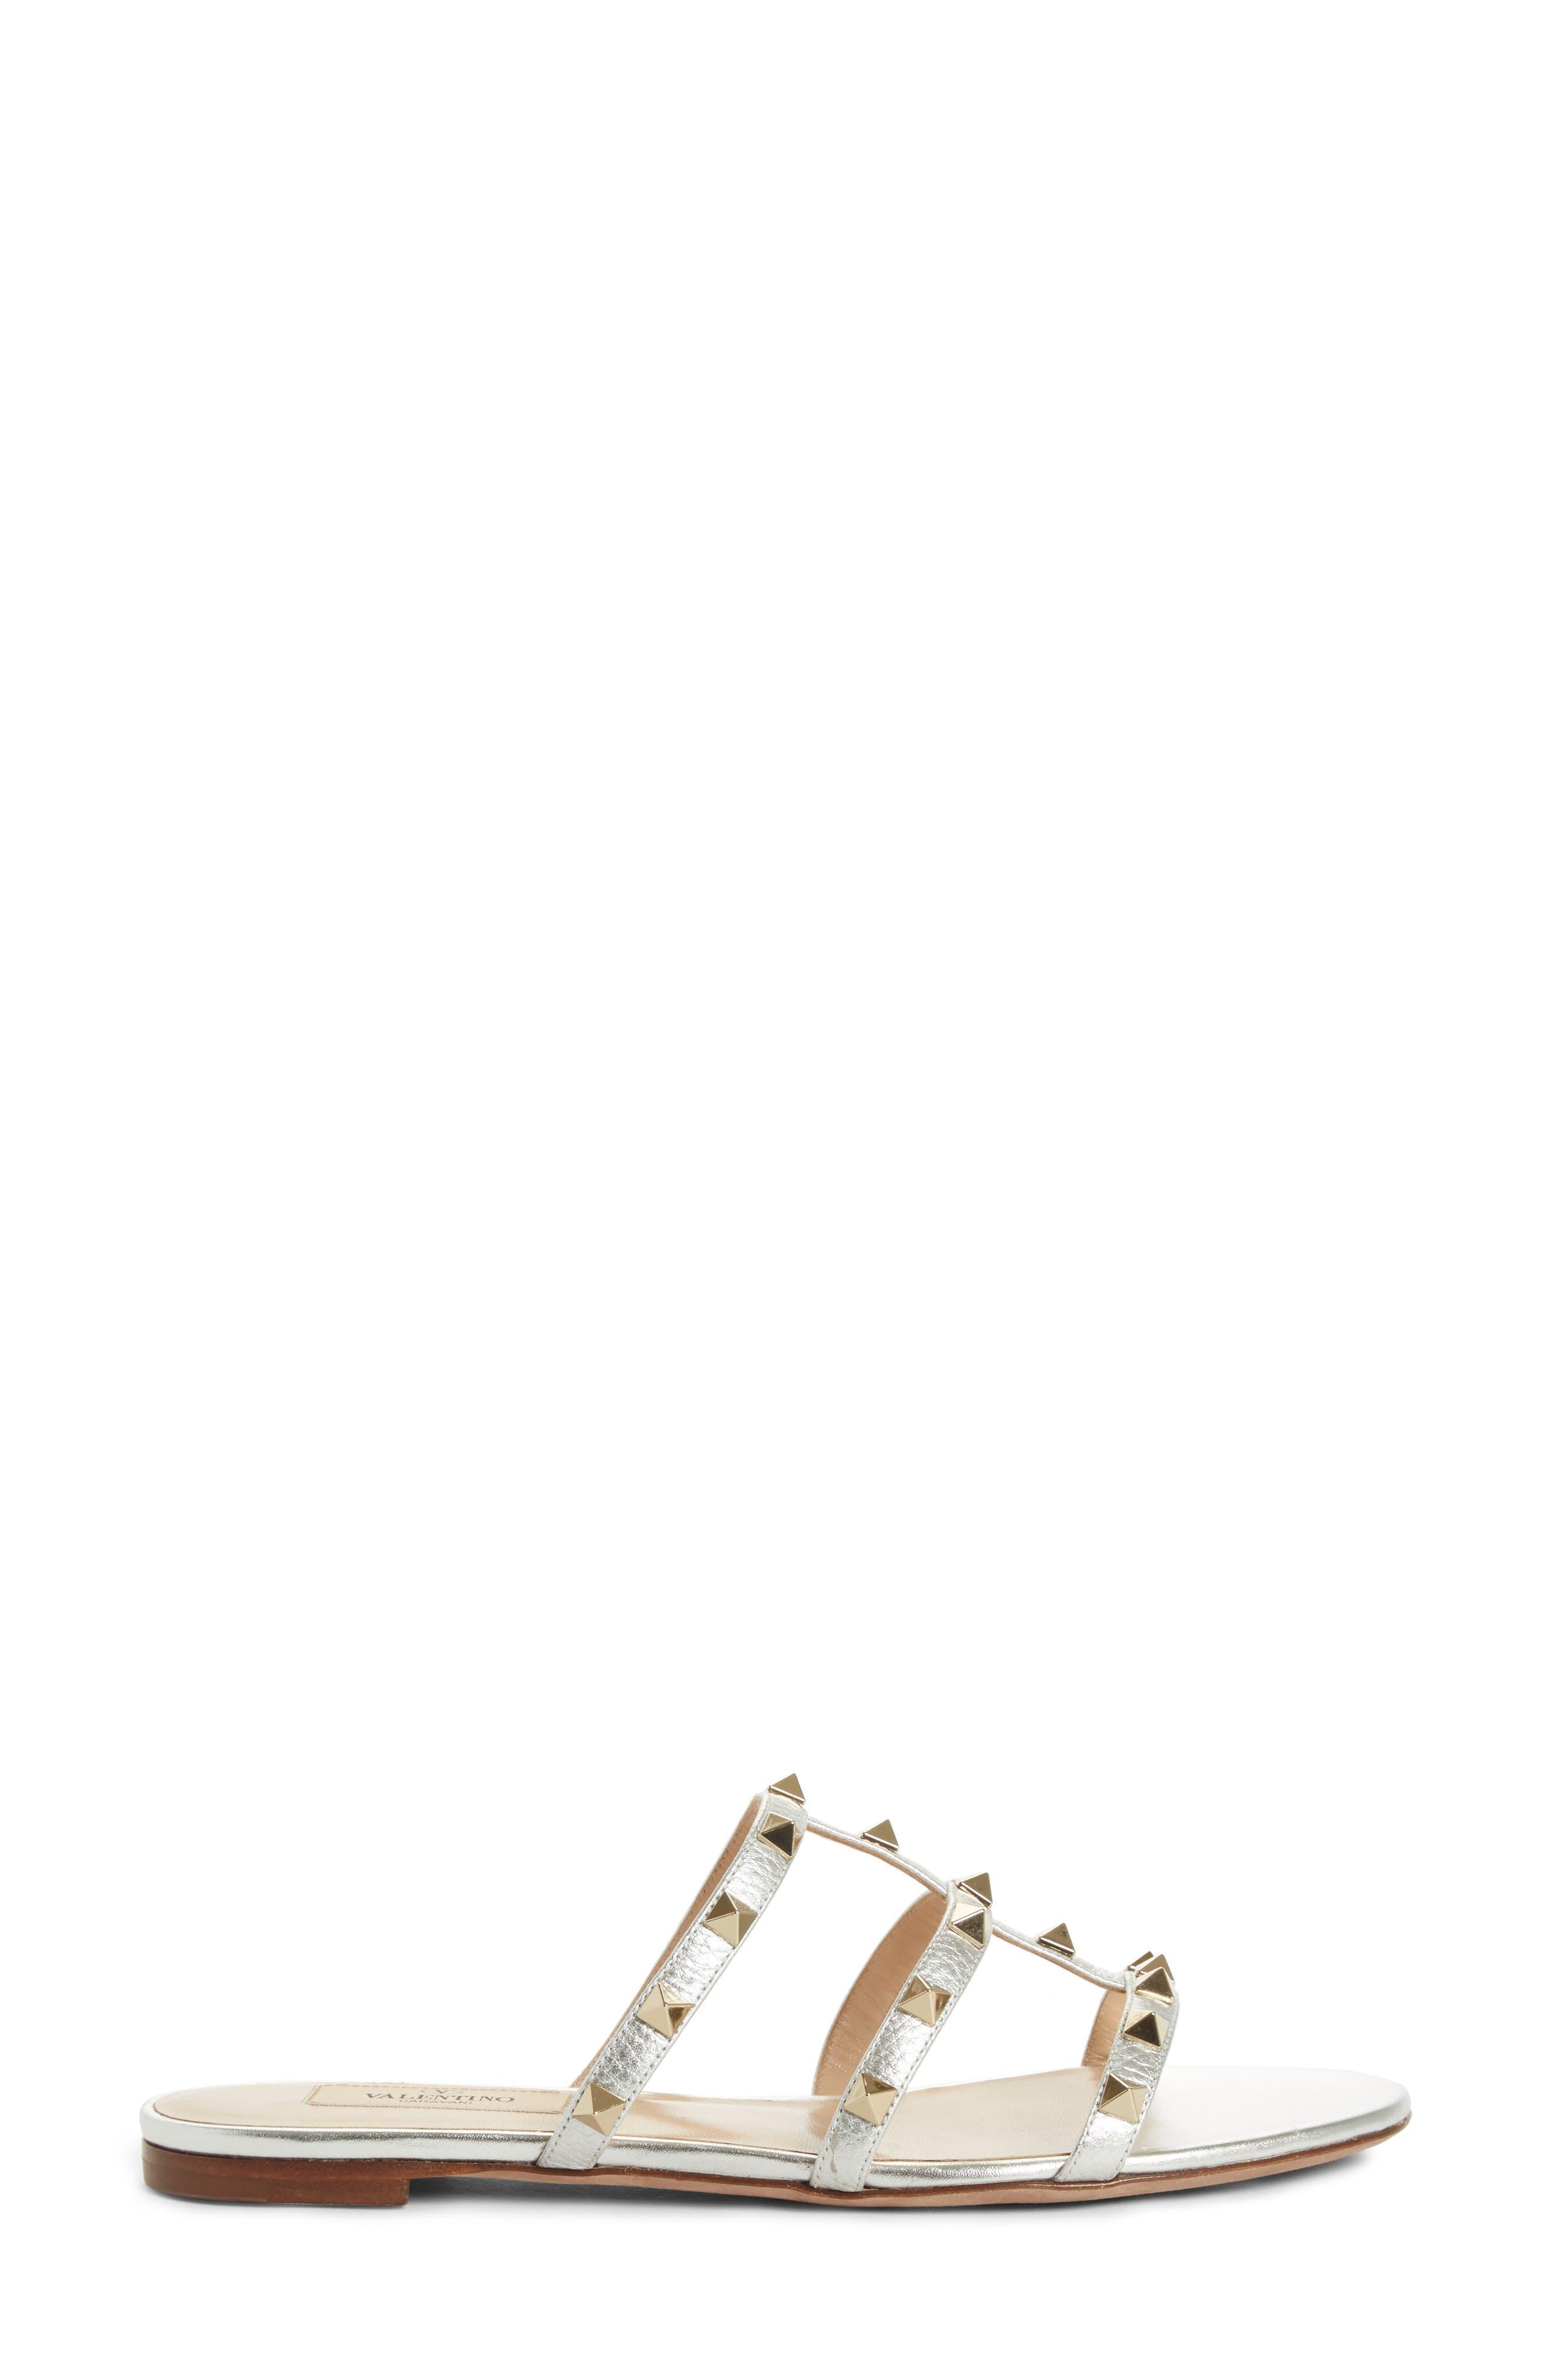 Rockstud Cage Slide Sandal,                             Alternate thumbnail 3, color,                             Metallic Silver